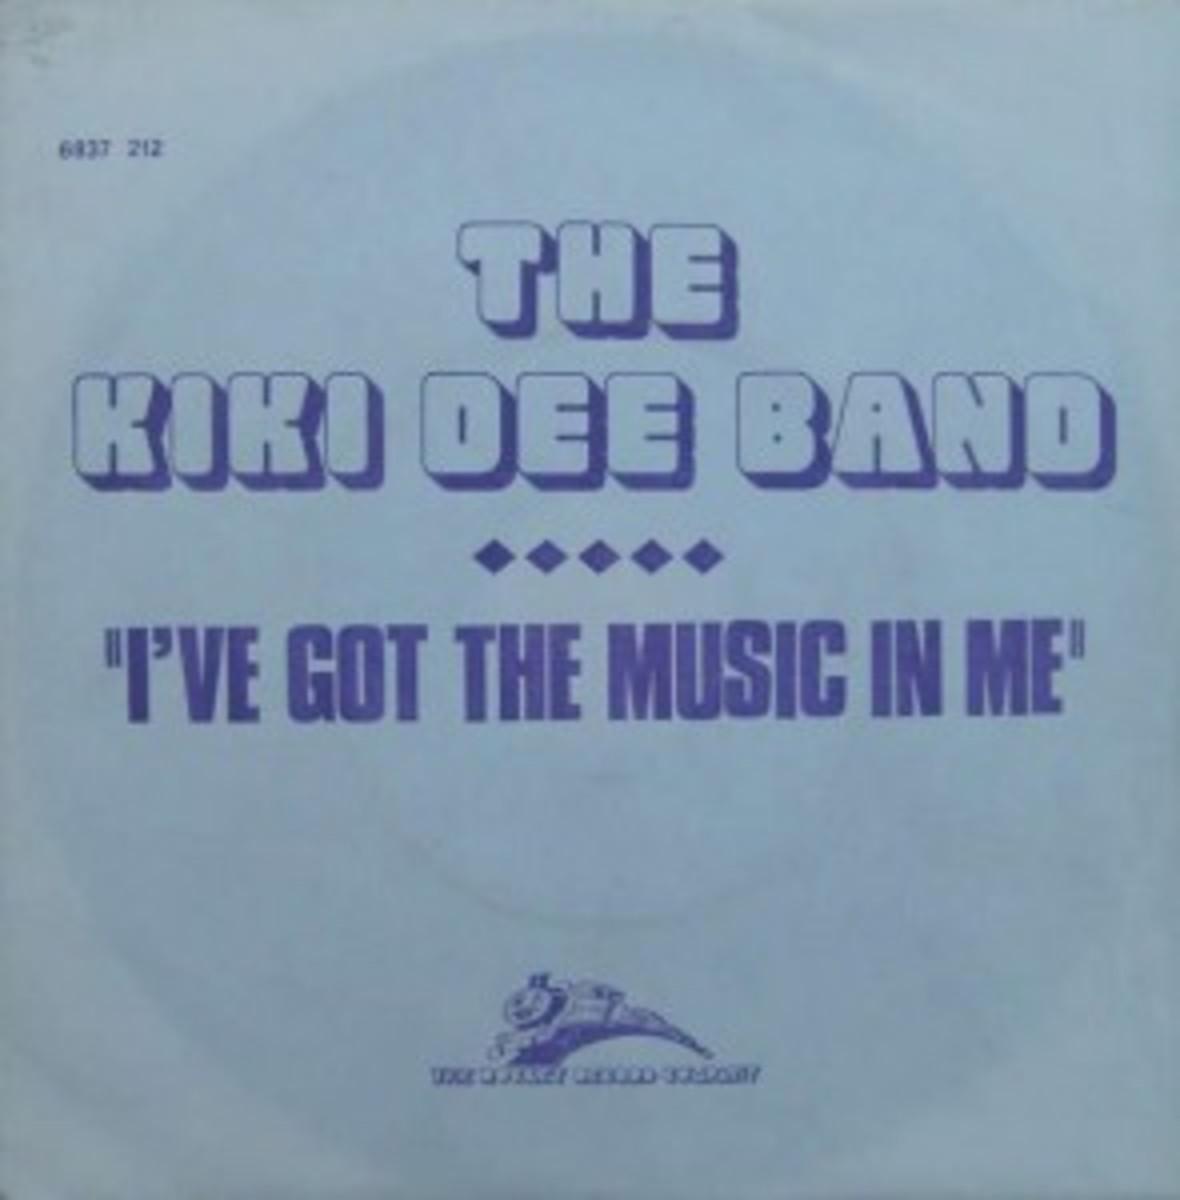 Kiki Dee Band I've Got The Music In Me